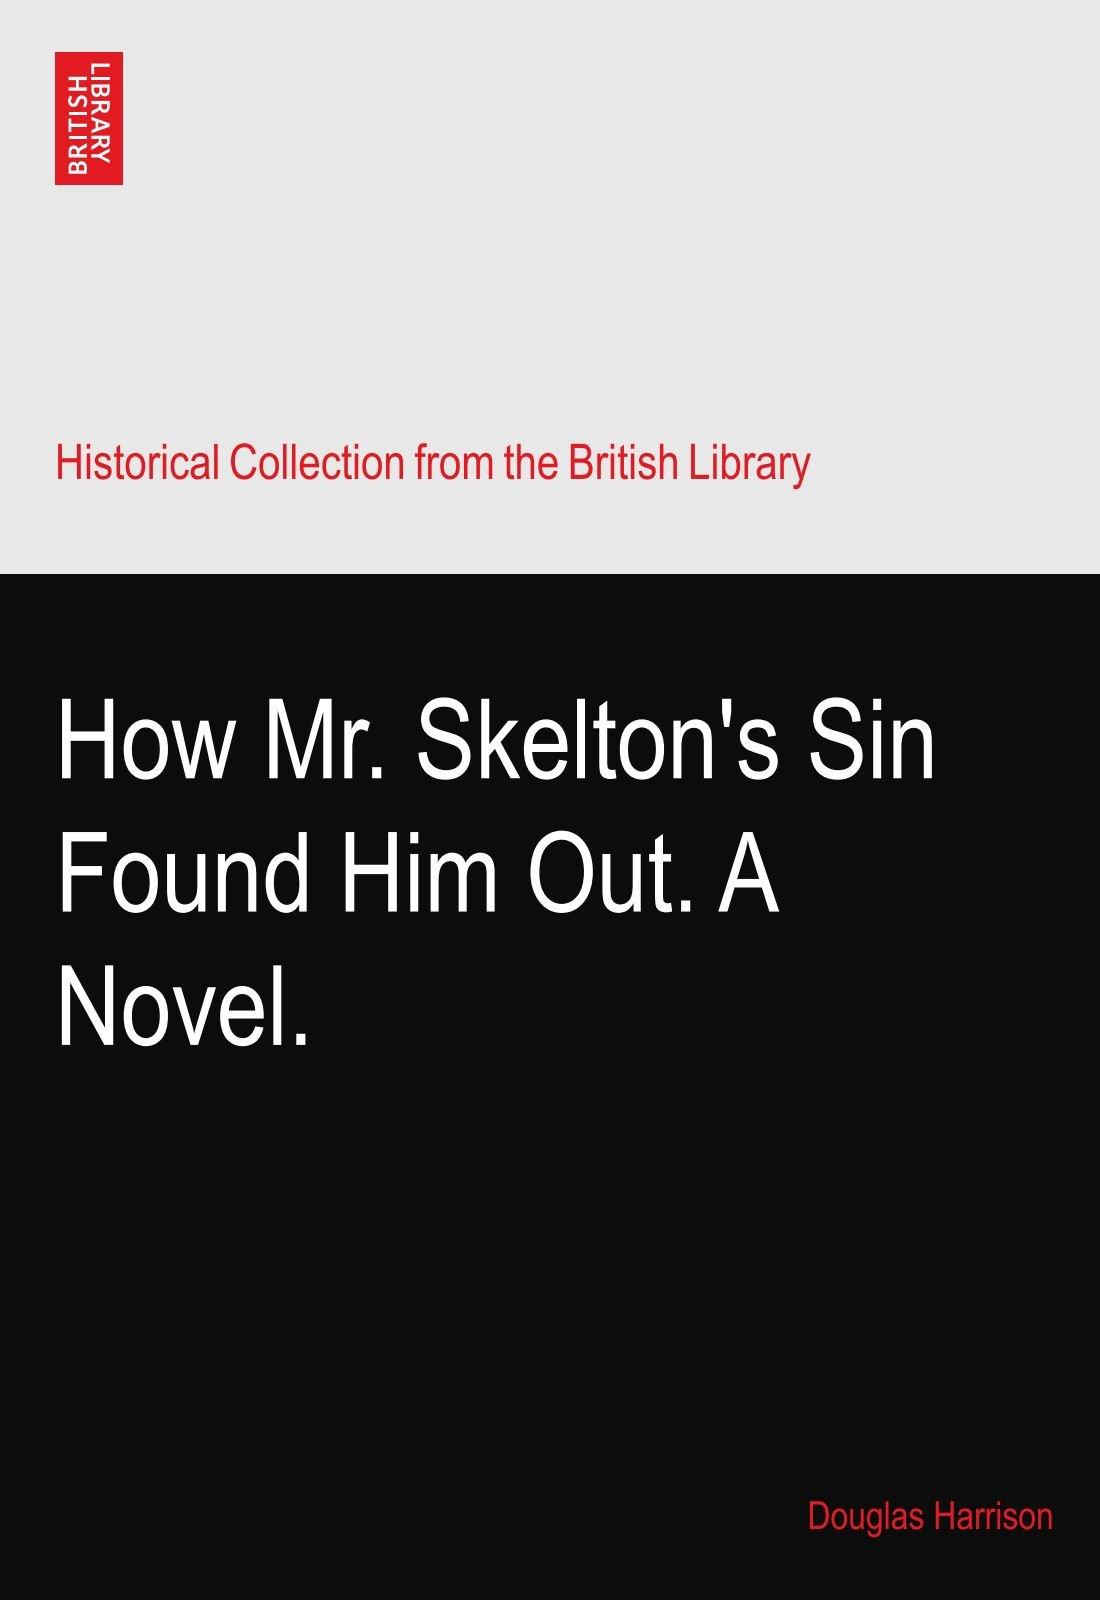 How Mr. Skelton's Sin Found Him Out. A Novel. pdf